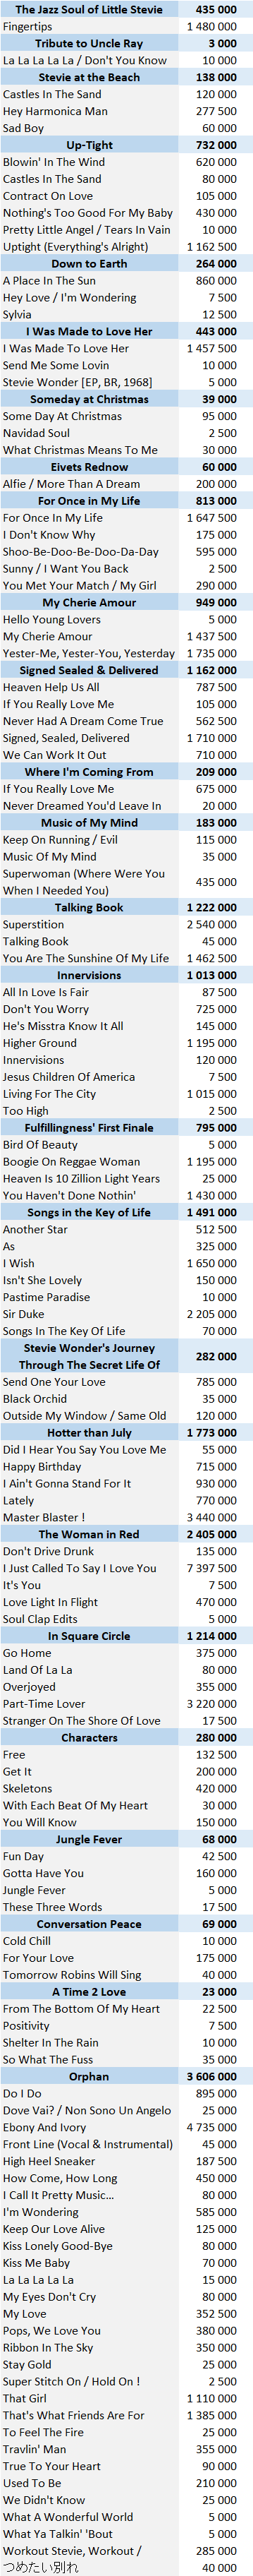 CSPC Stevie Wonder physical singles sales